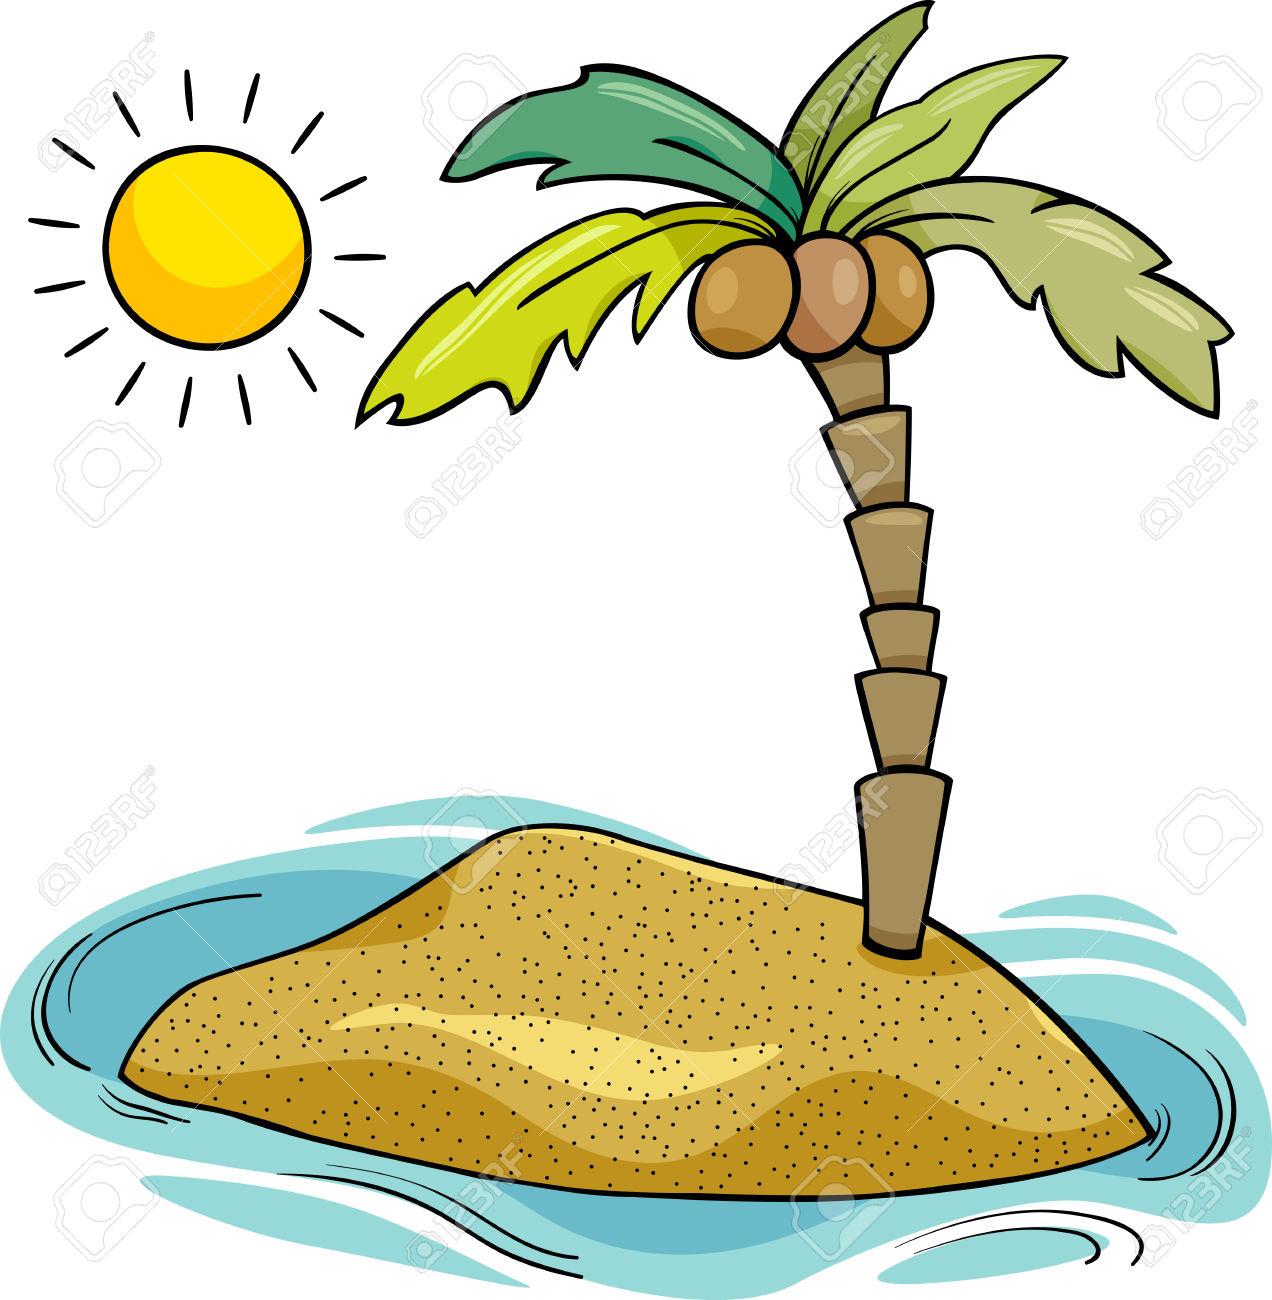 1272x1300 Cartoon Of Desert Island With Coconut Palm Stock Vector Id Island